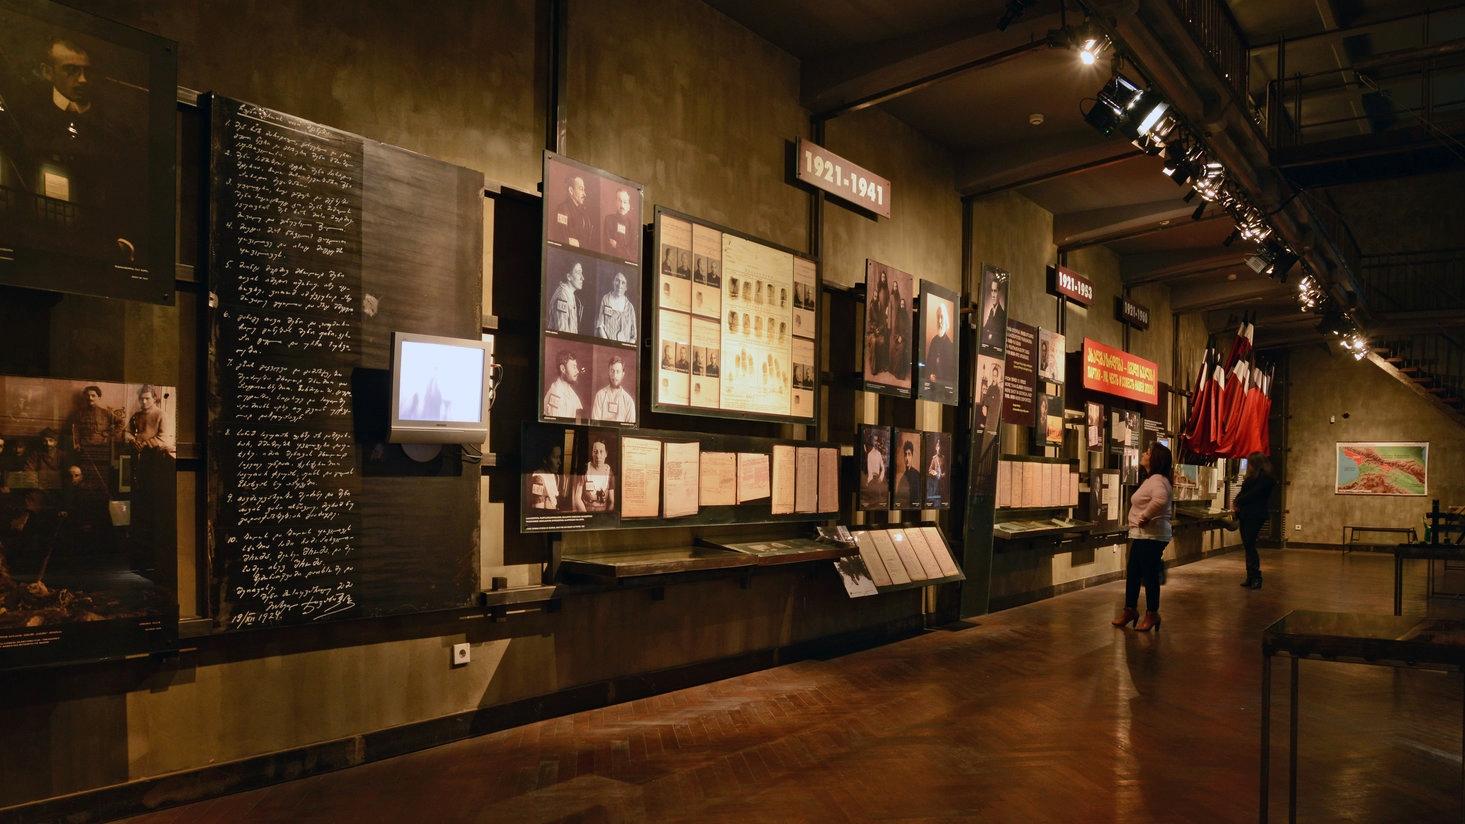 Soviet Occupation Exhibition Hall